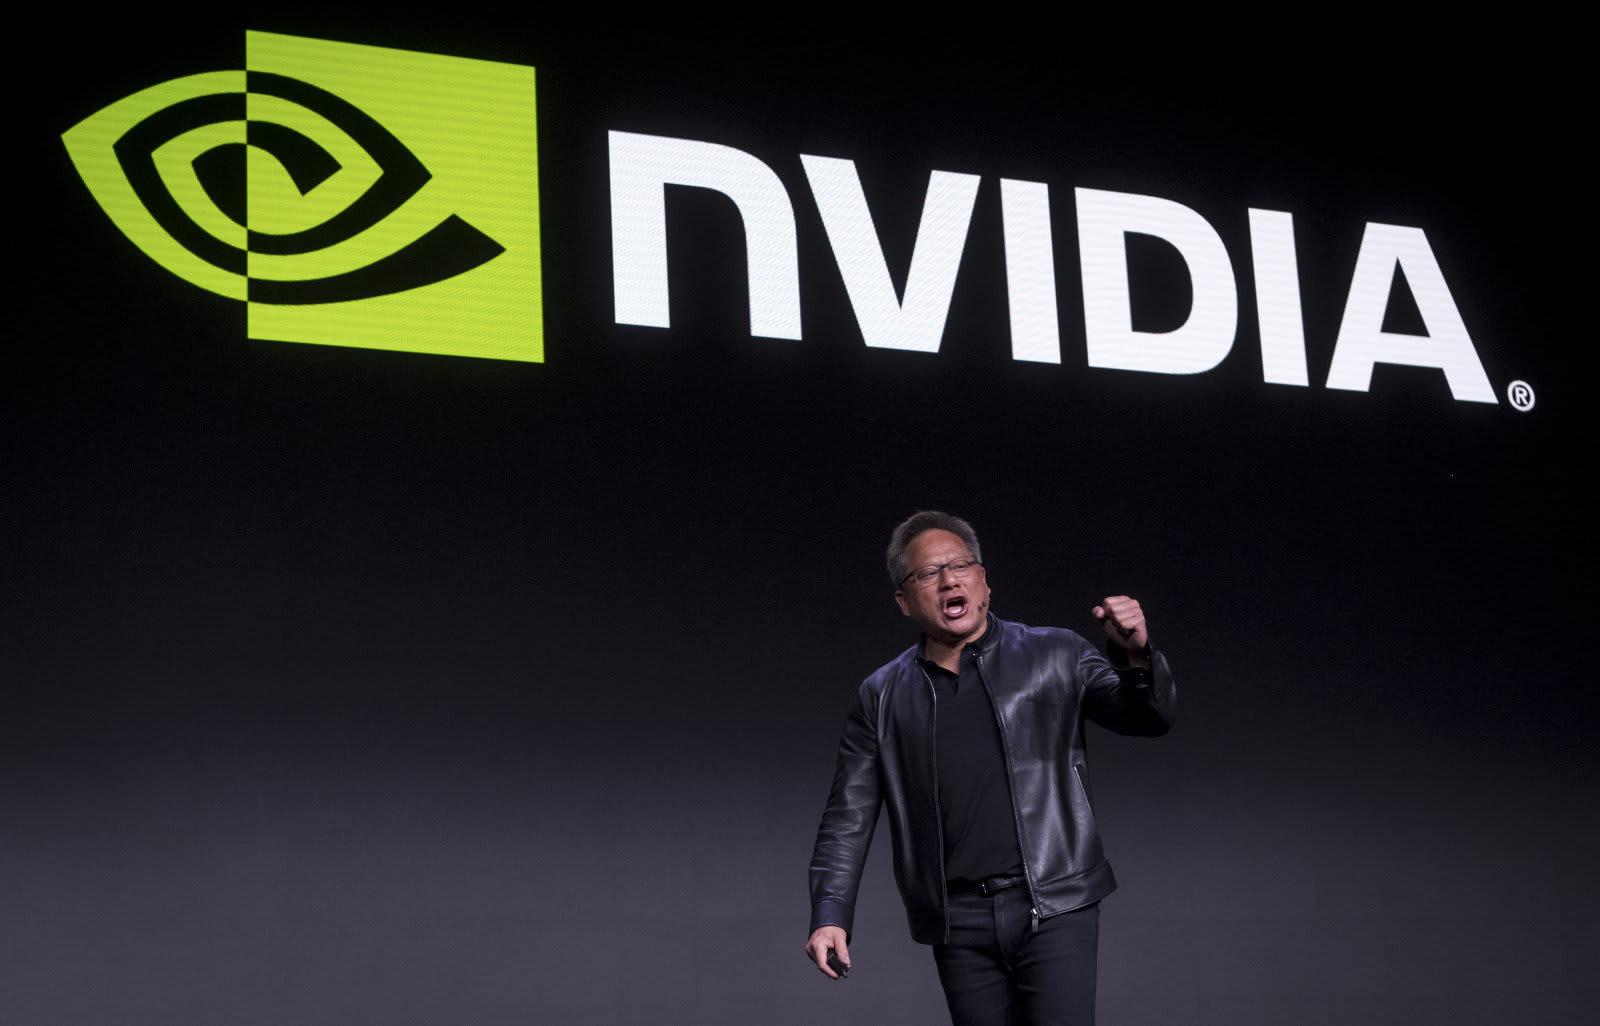 NVIDIA 正式以 69 億美元買下以色列晶片公司 Mellanox